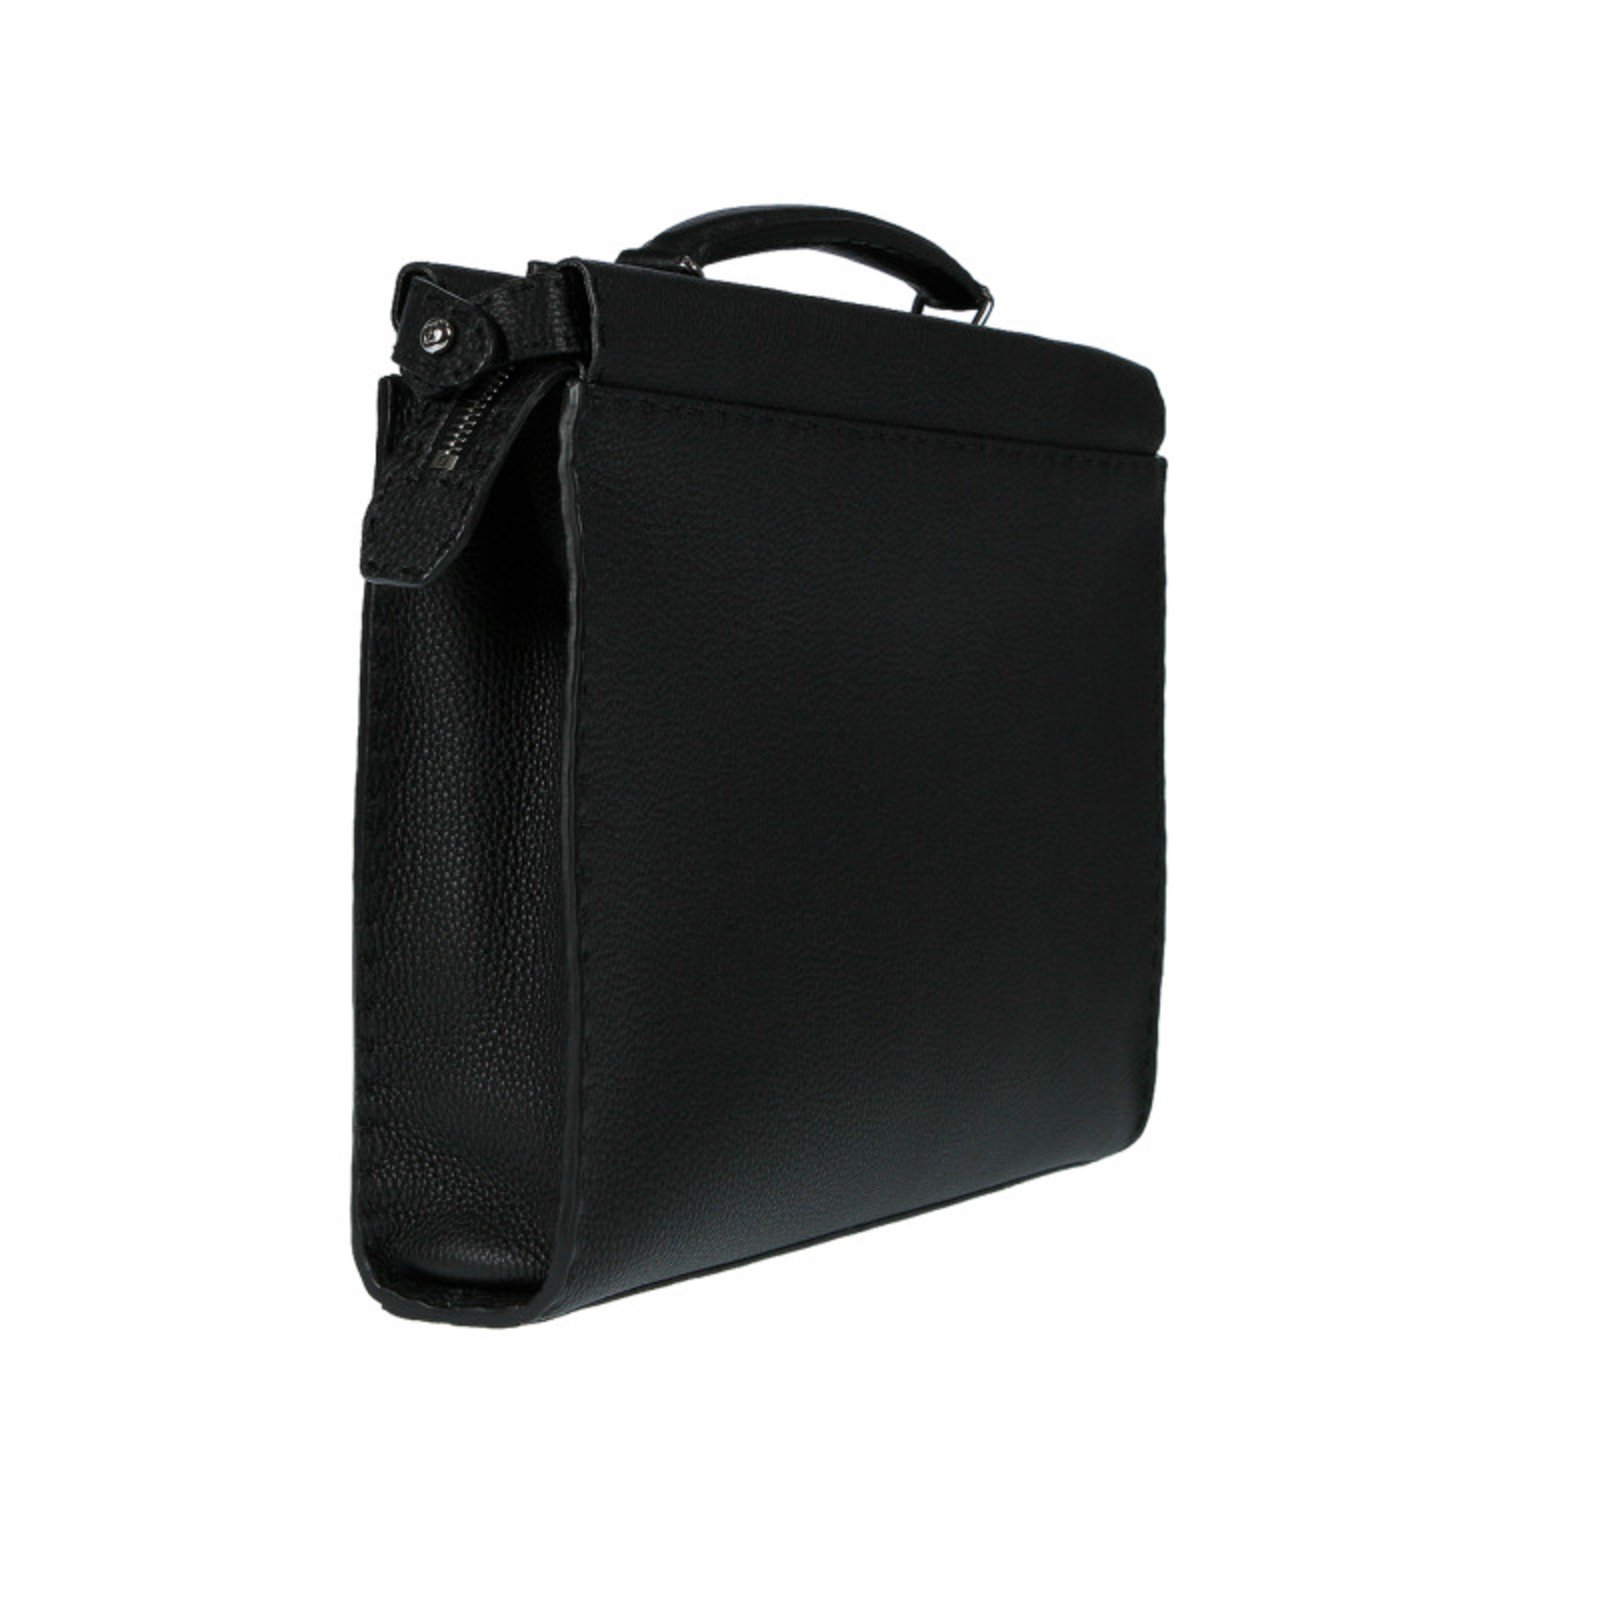 a20e3ddc8ab Fendi Fendi mens bag new Bags Briefcases Leather Black ref.72152 - Joli  Closet